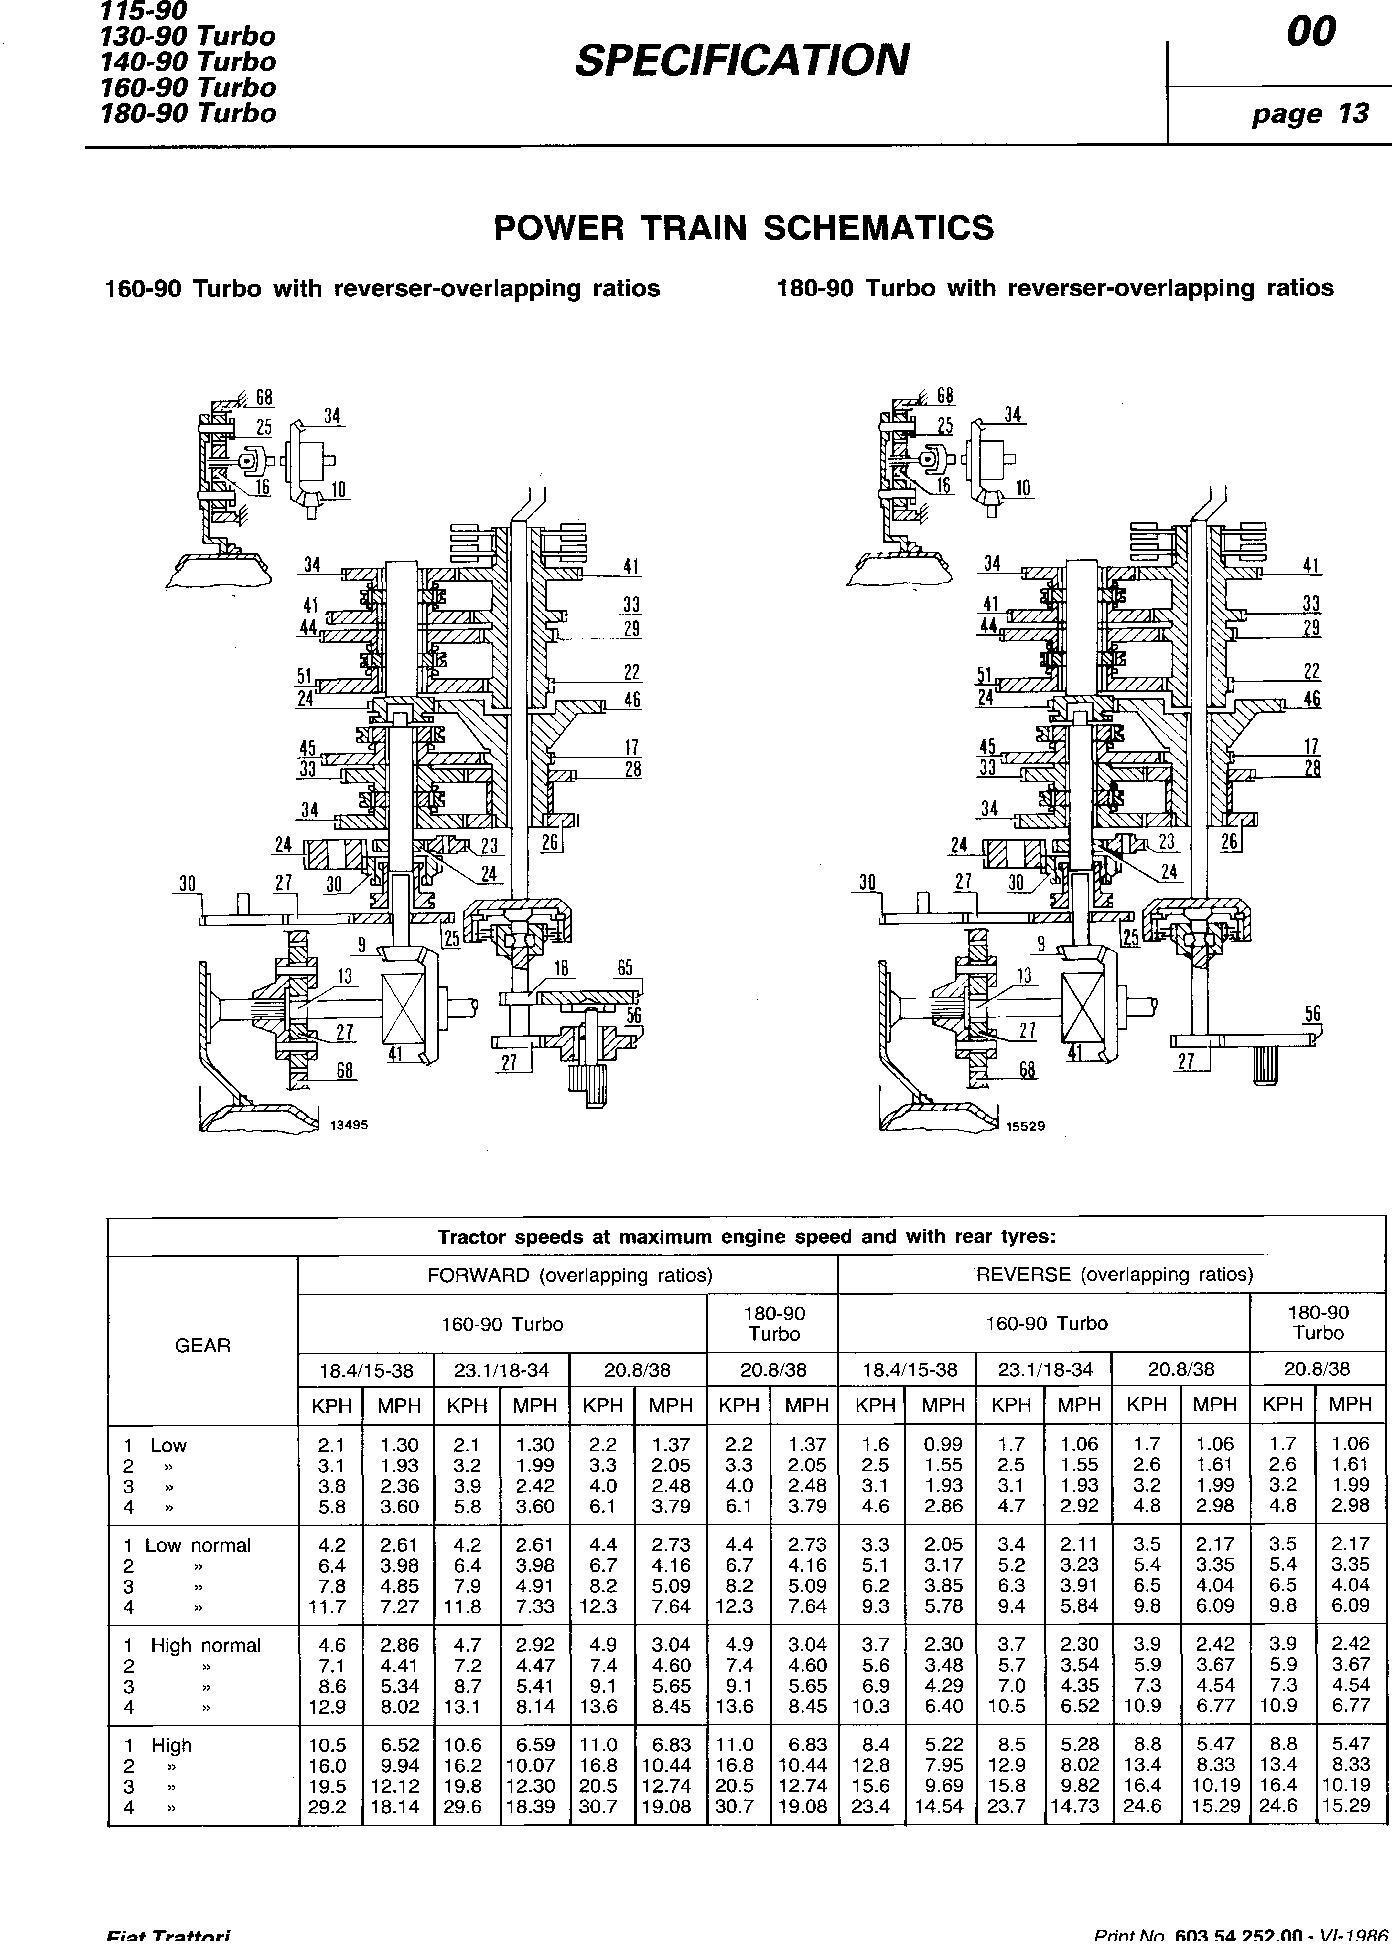 Fiat 115-90, 130-90, 140-90, 160-90, 180-90 Turbo Tractor Service Manual - 2